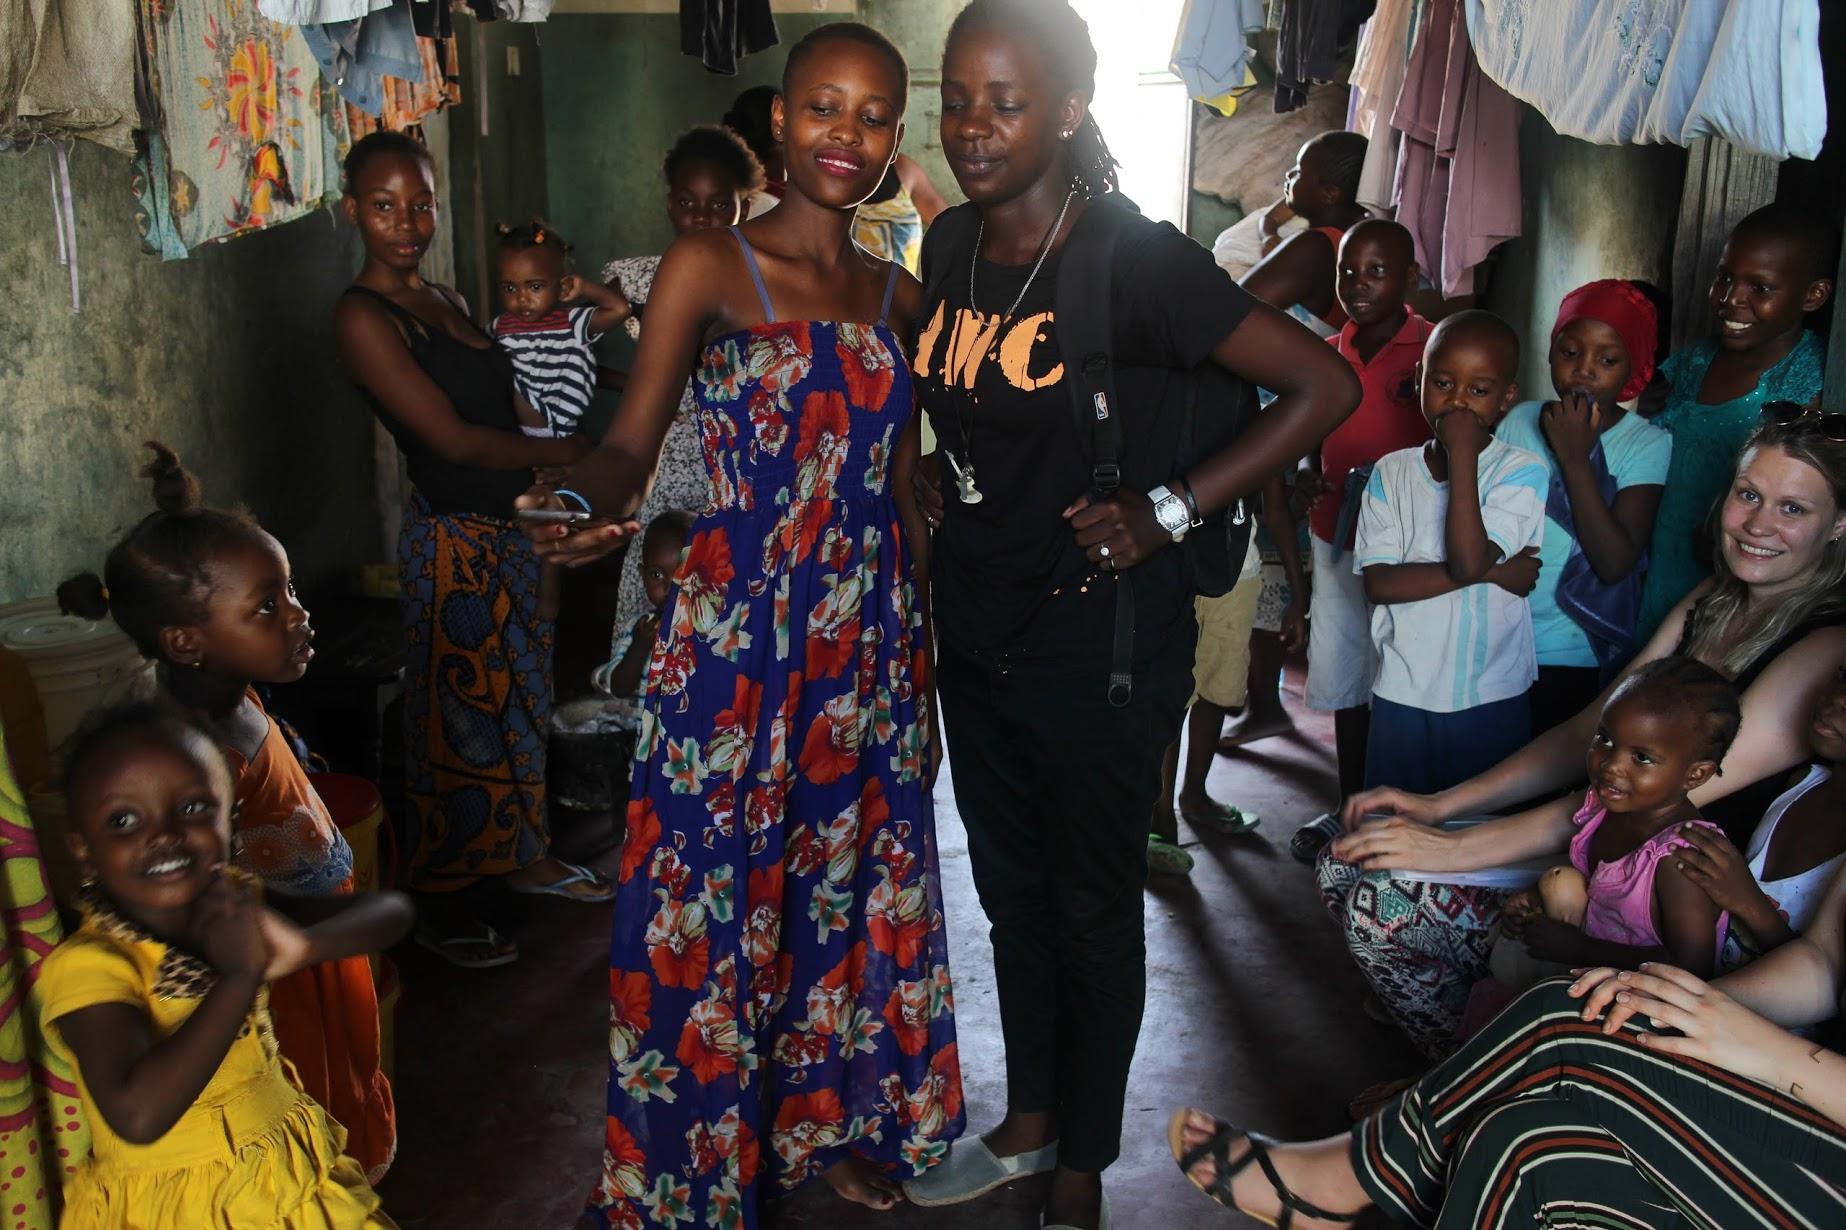 People in  Bombolulu , near Mombasa, Kenya